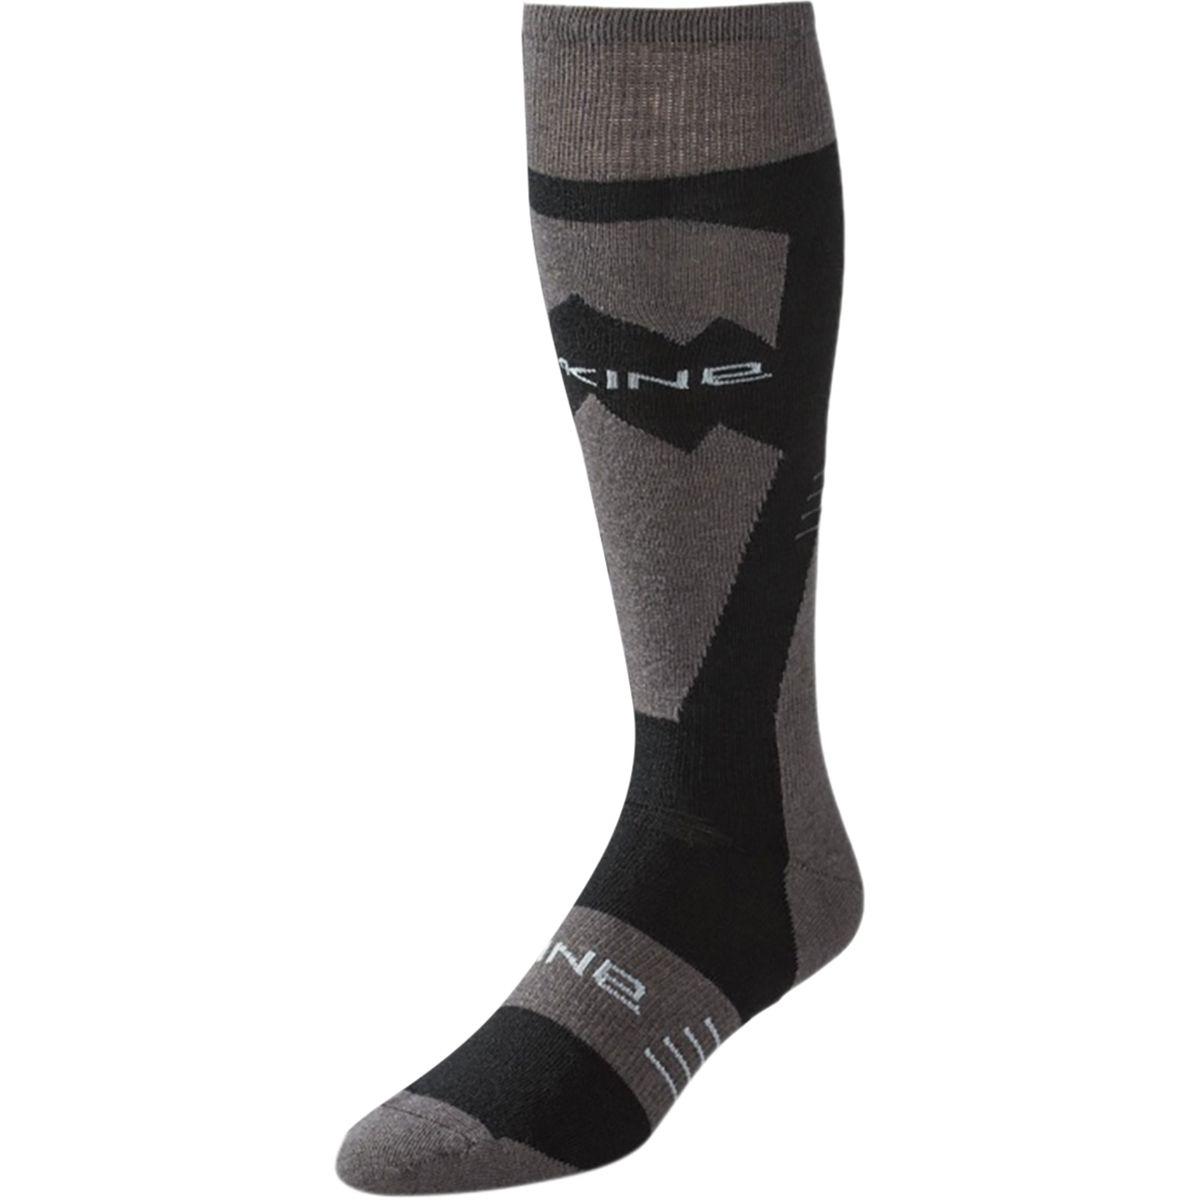 DaKine Summit Sock